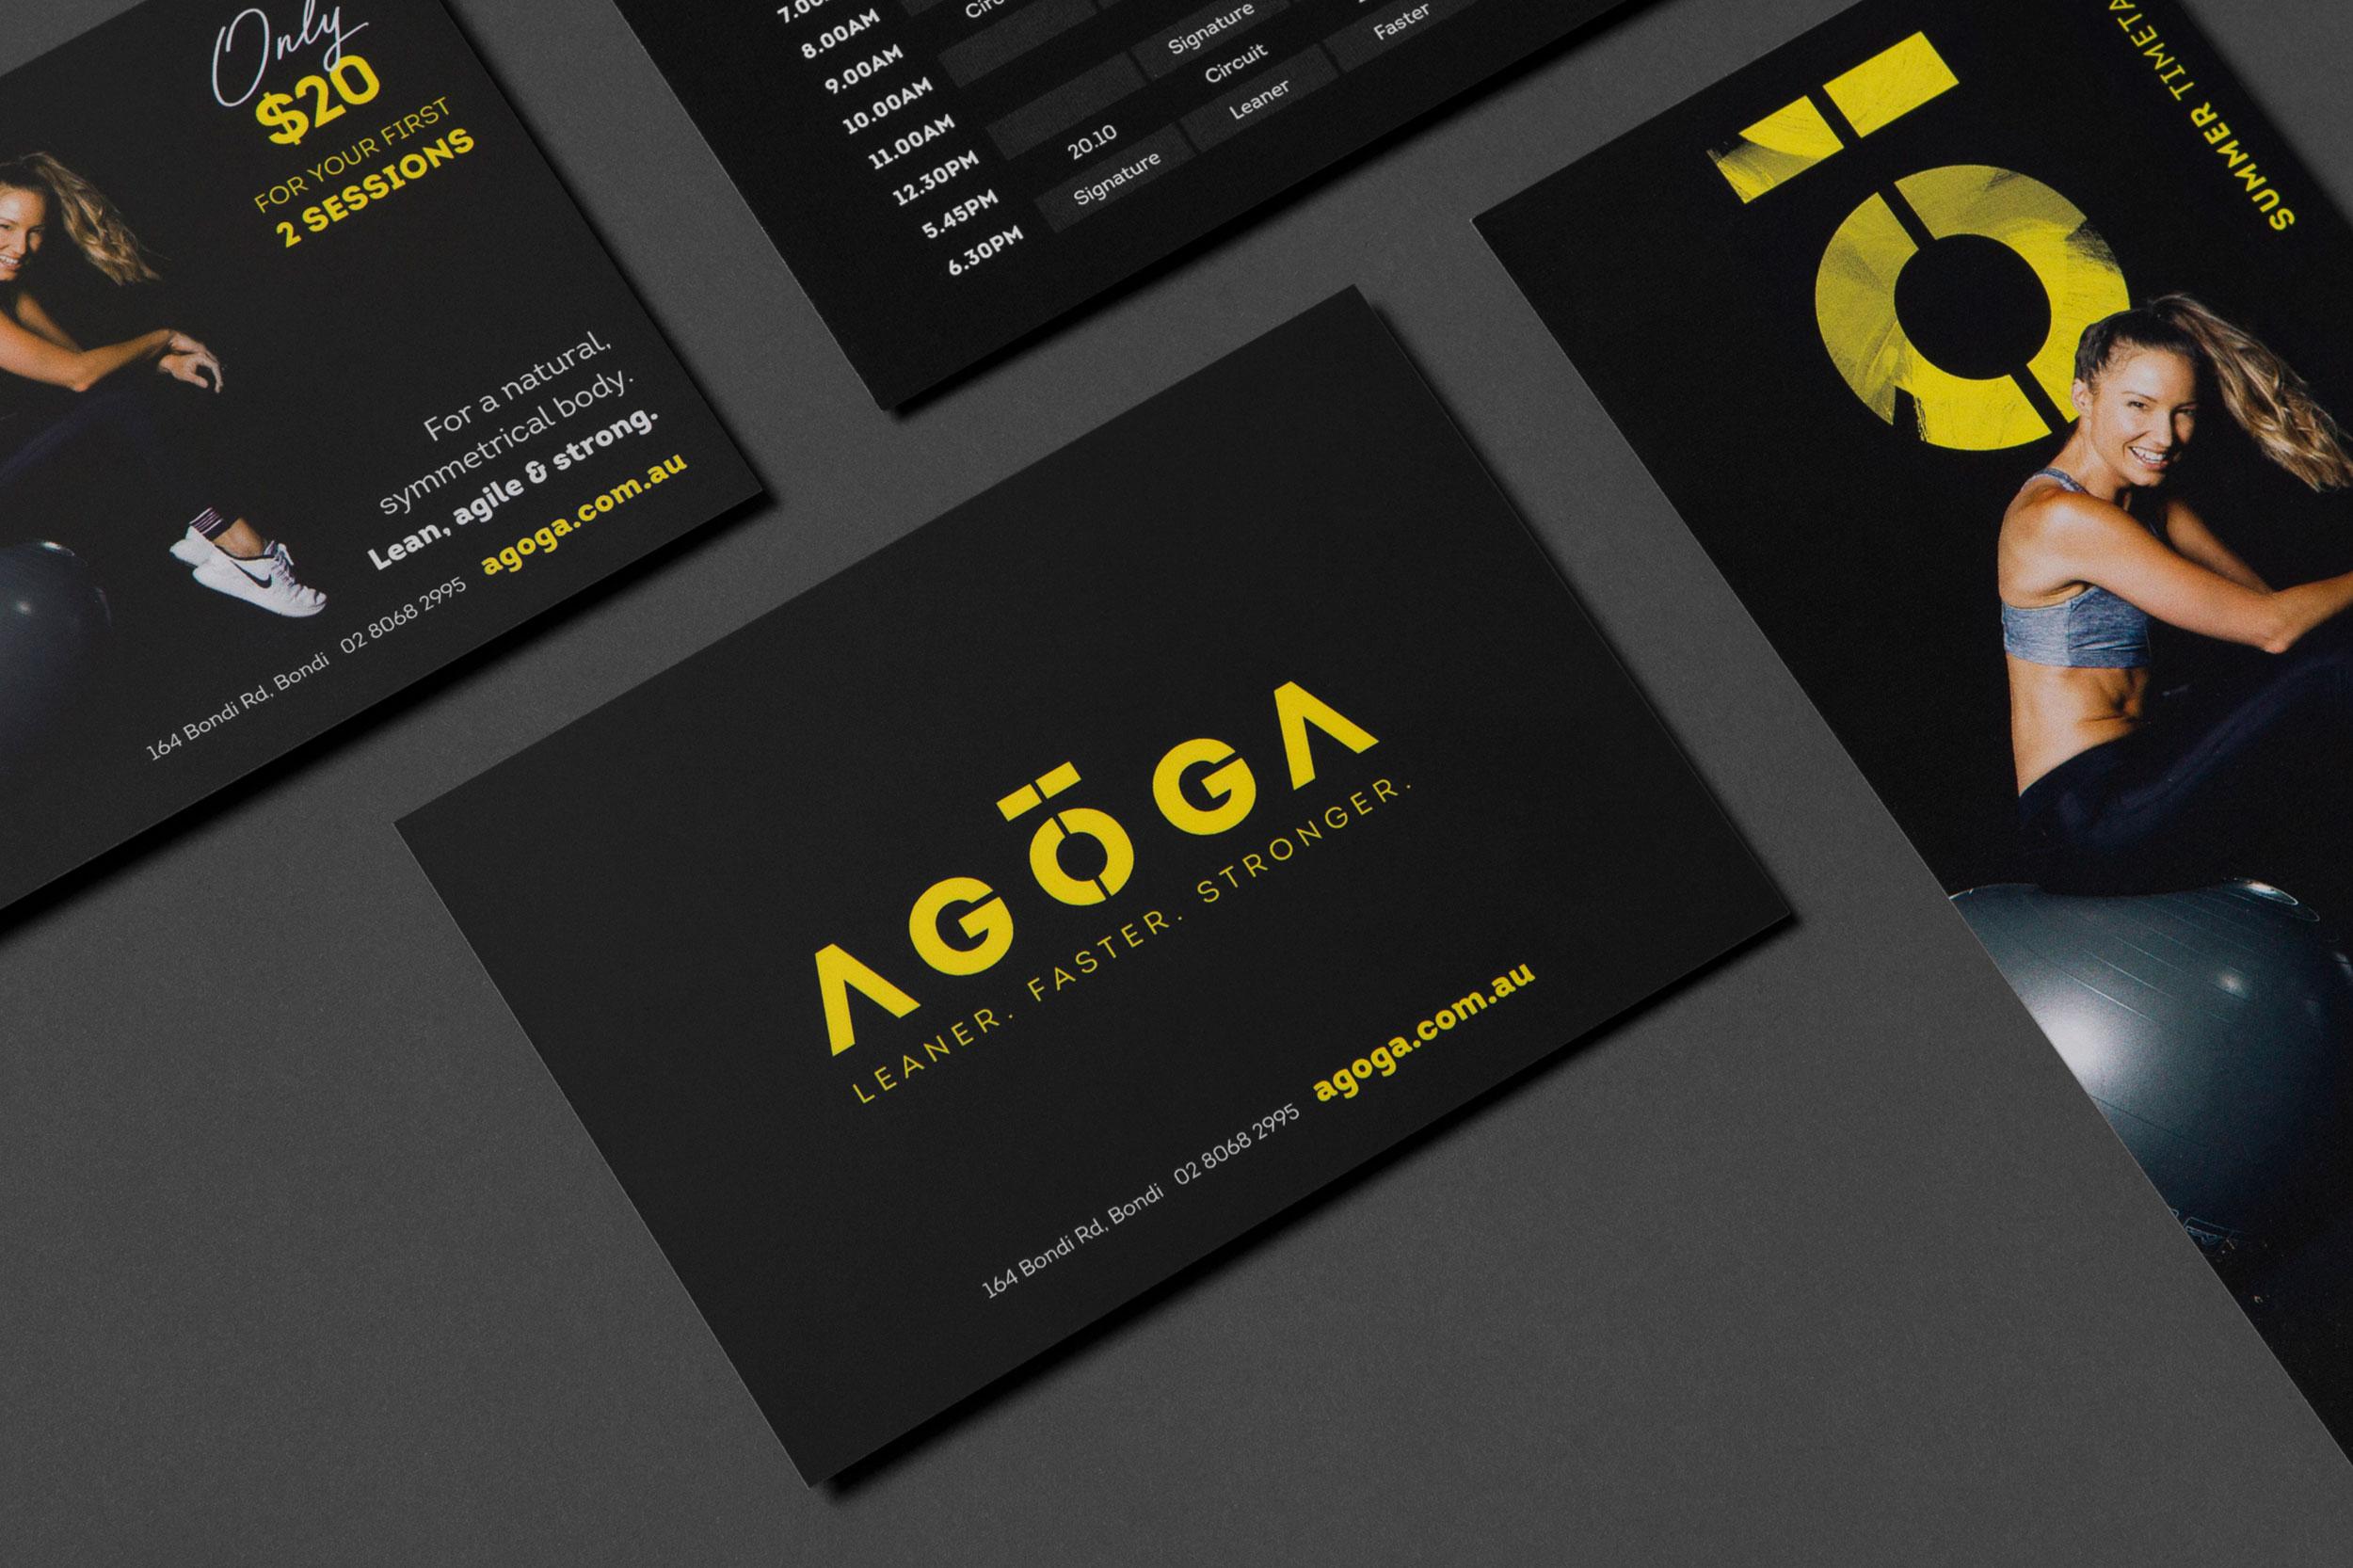 Agoga - Graphic Design by Neverland Studio